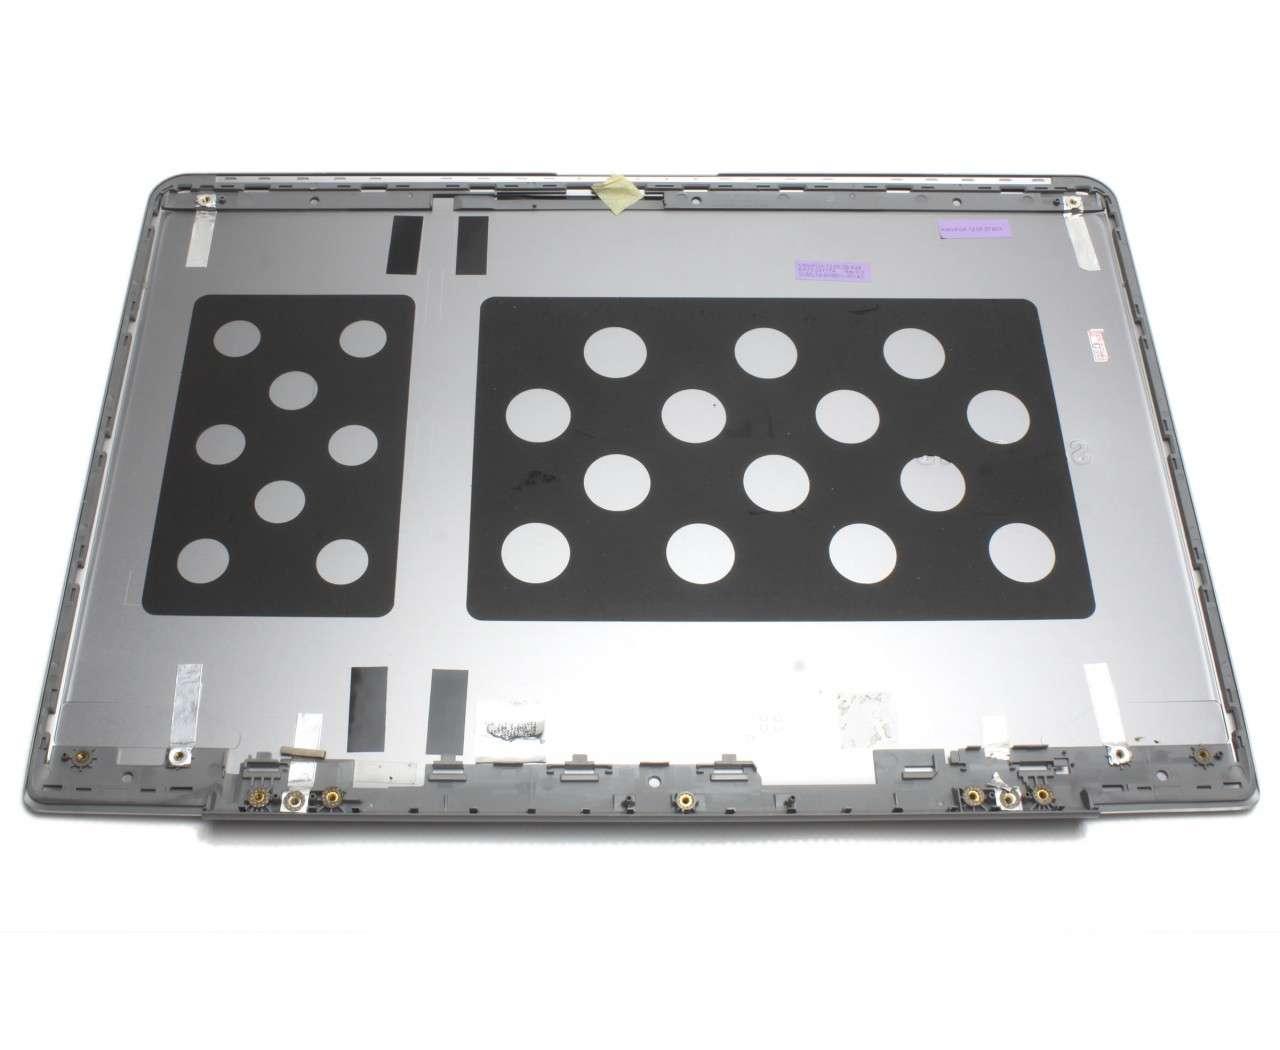 Capac Display BackCover Samsung BA75 03717A Carcasa Display imagine powerlaptop.ro 2021